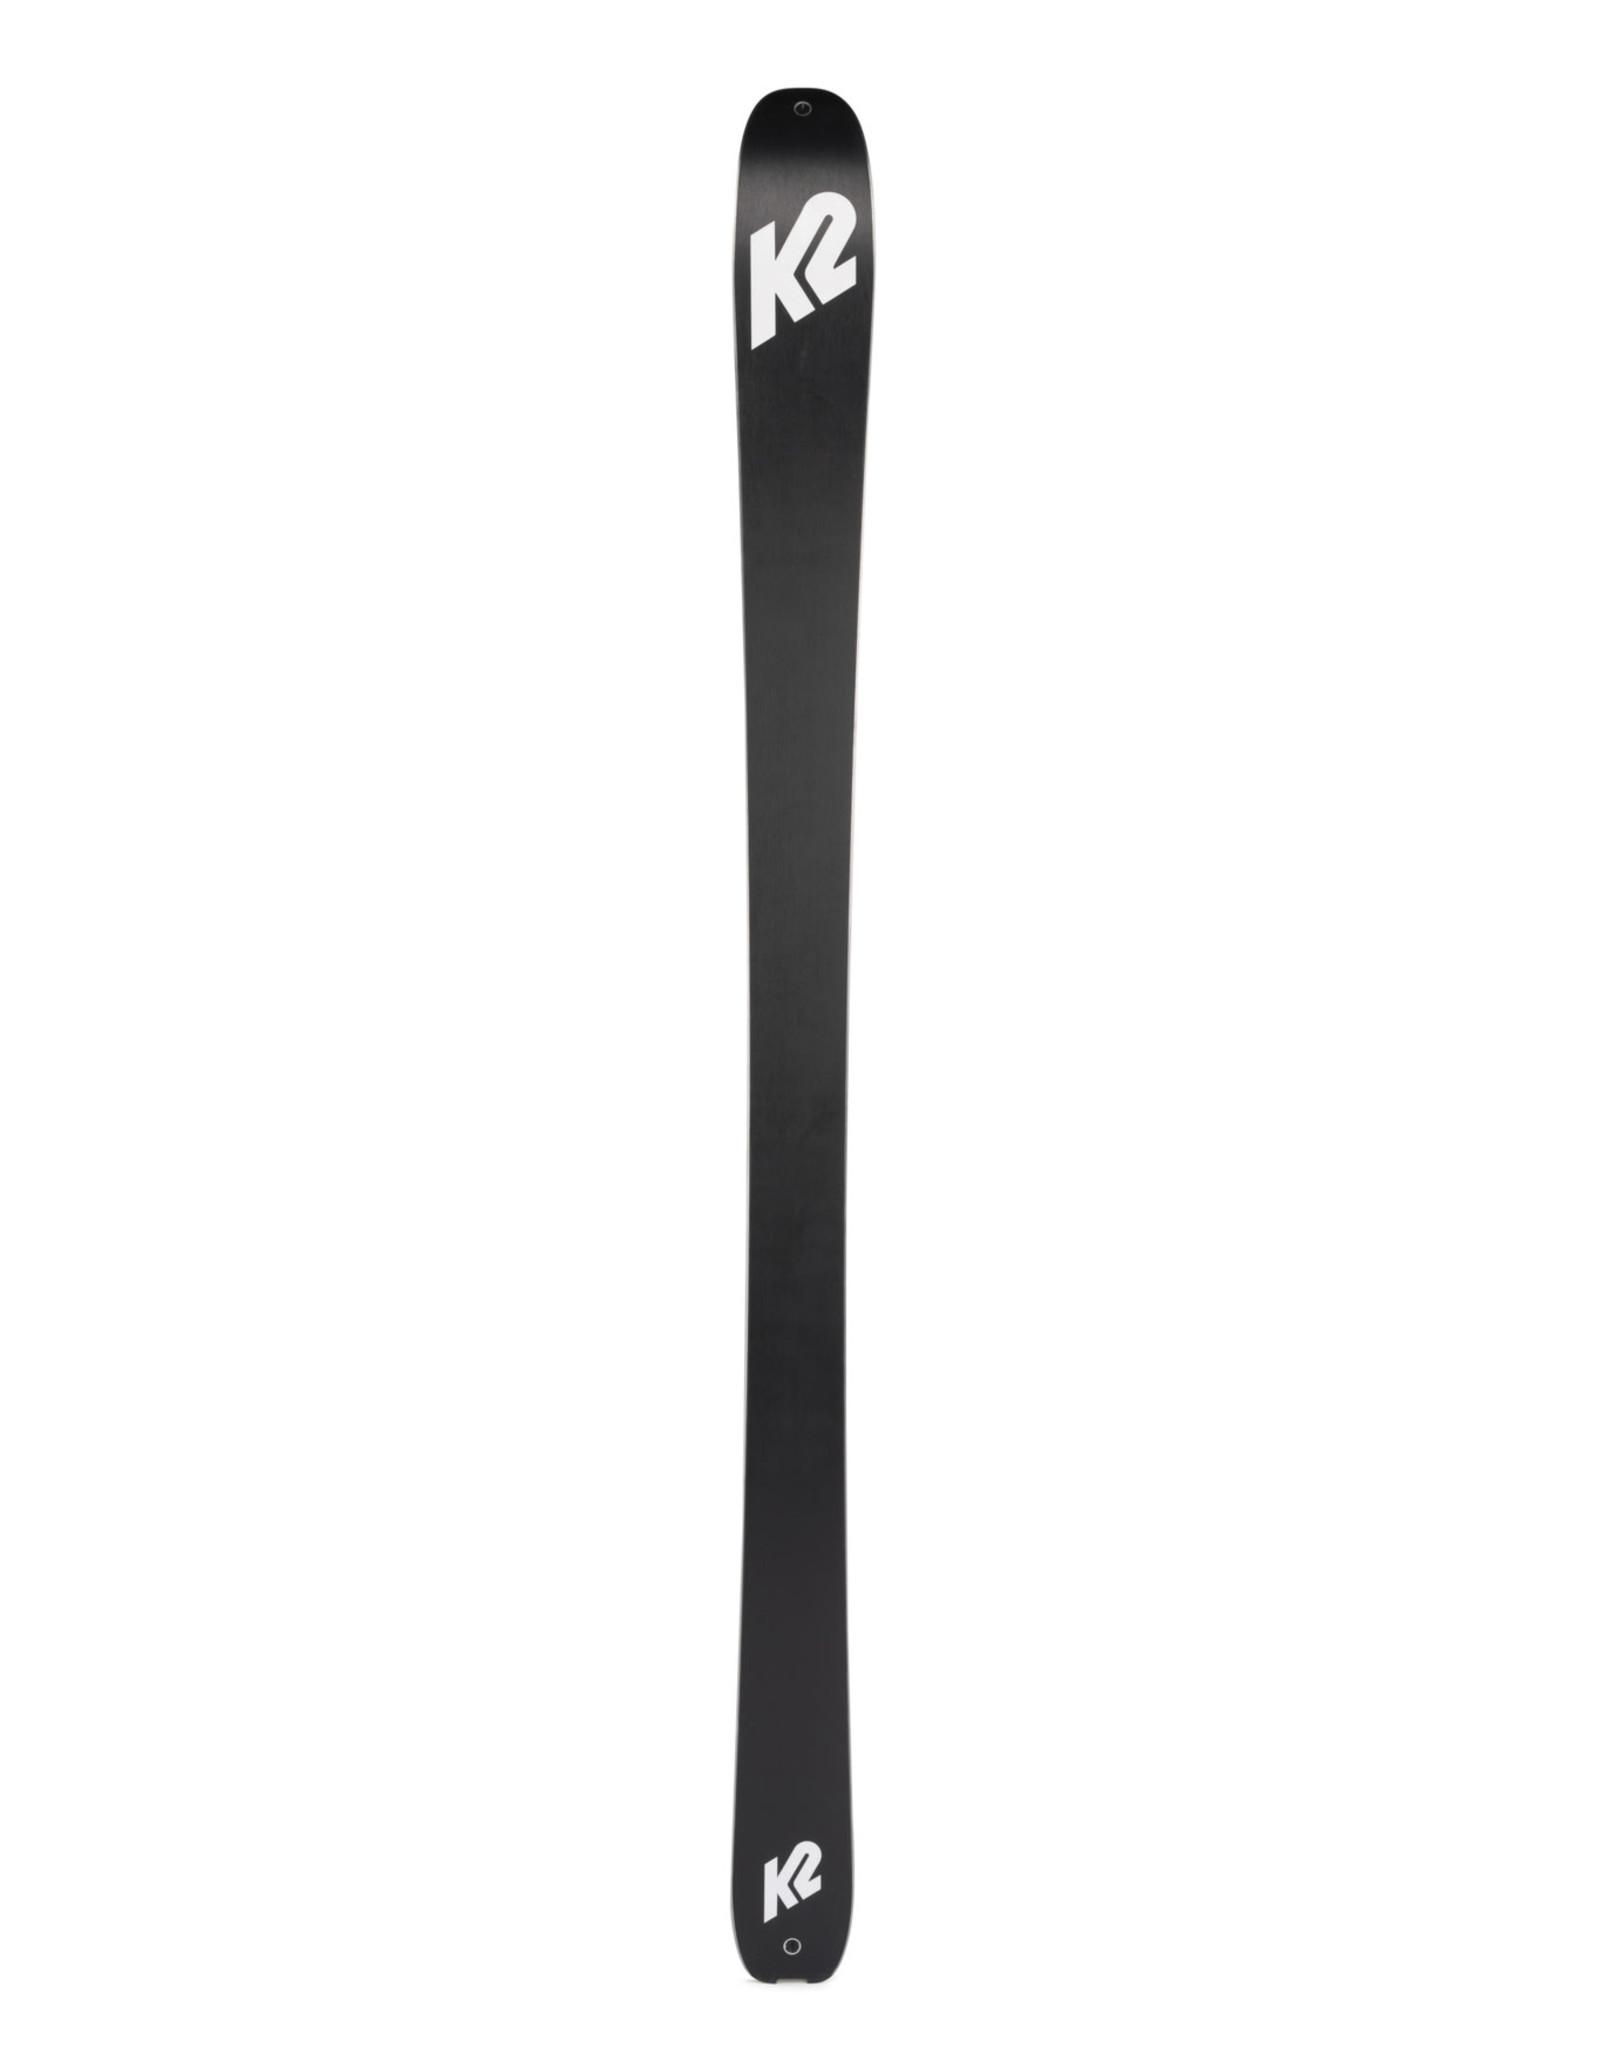 K2 K2 Skis TALKBACK 84 (21/22)